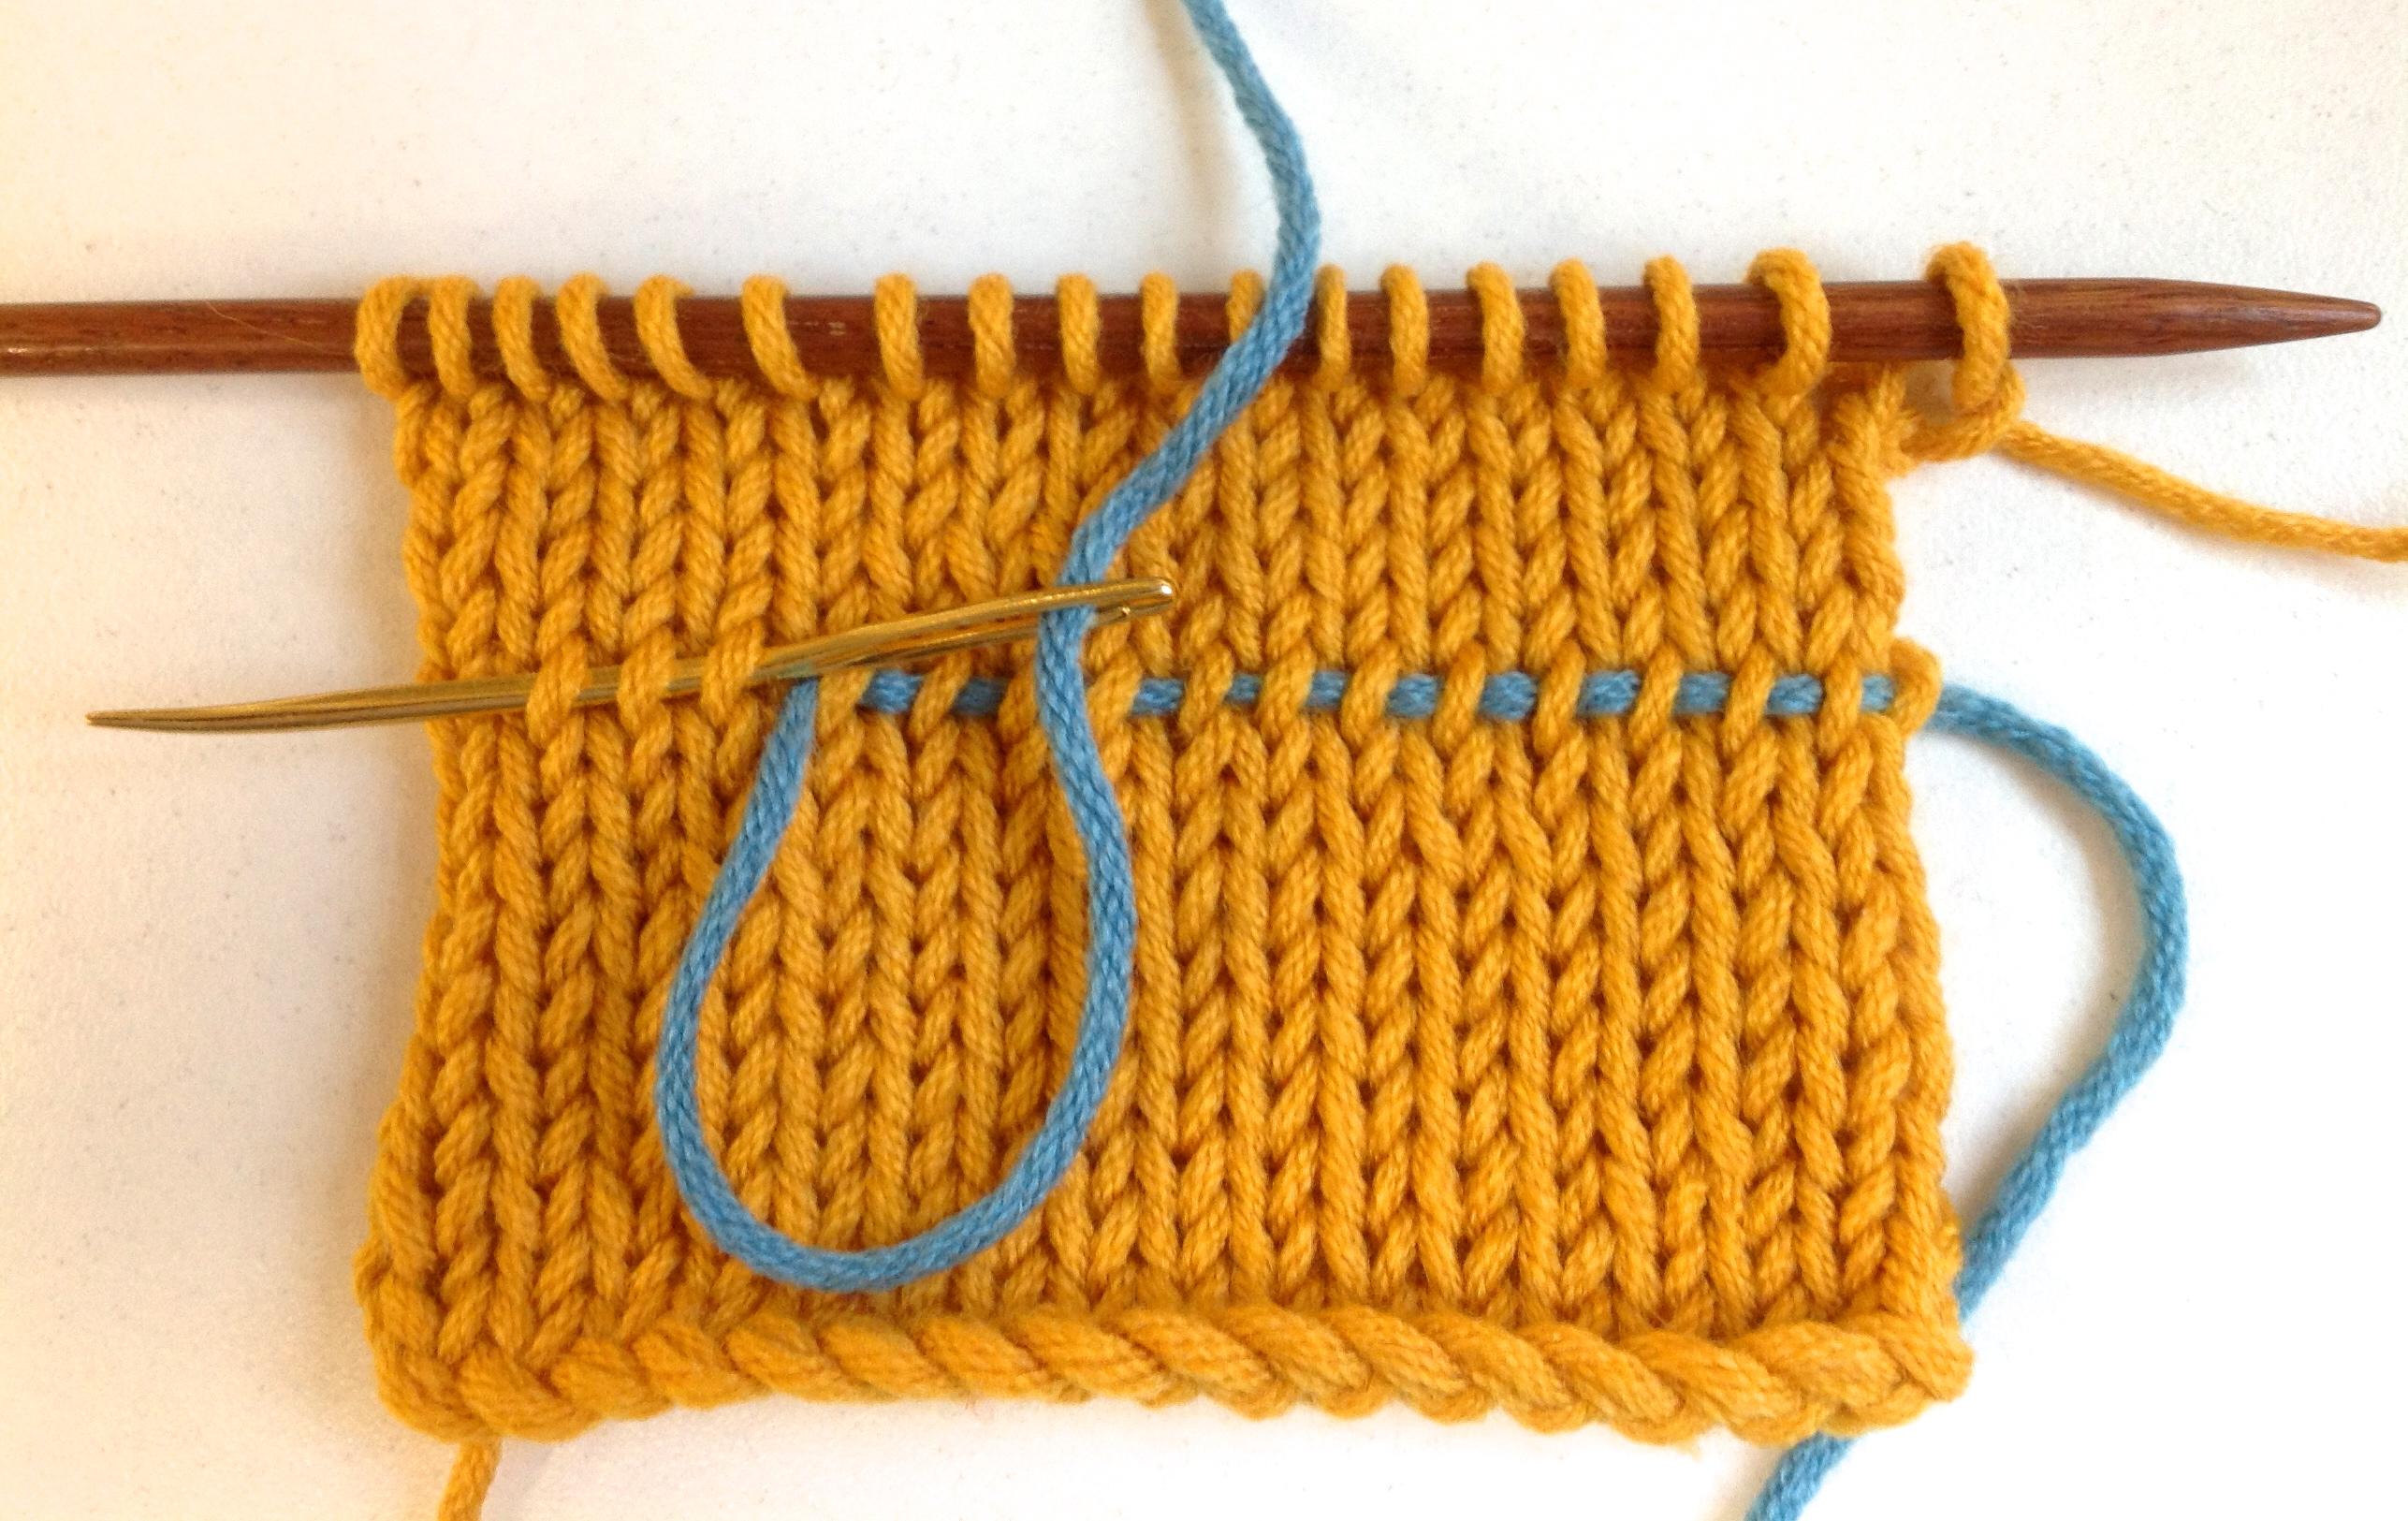 Knitting Lifeline Hole : Ask amanda how do i rip out my knitting and